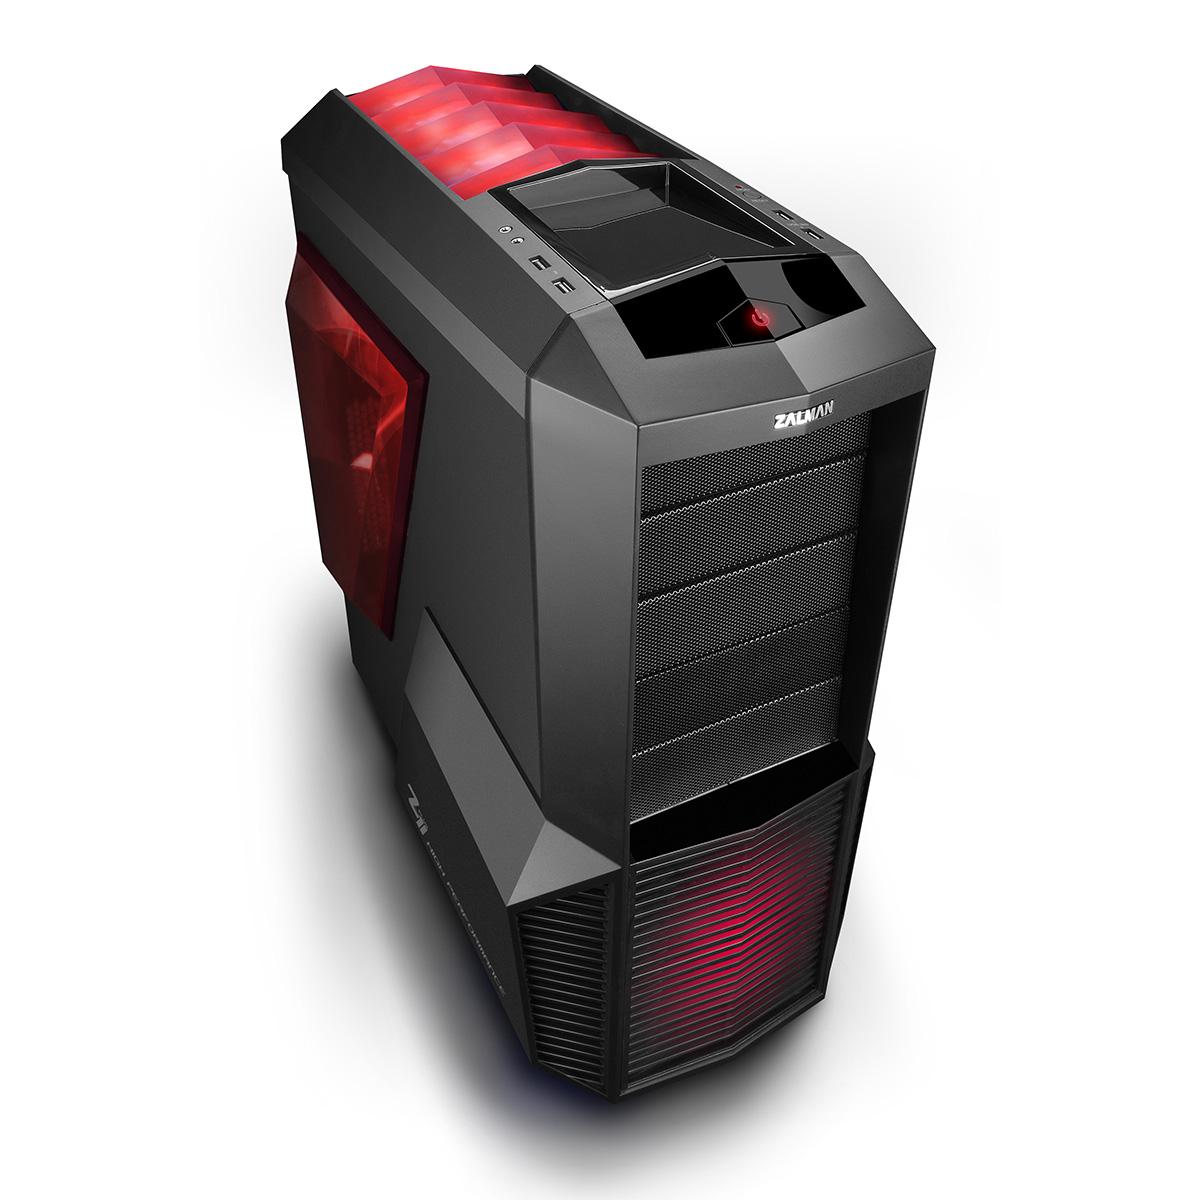 Boîtier PC Zalman Z11 Plus HF1 Boîtier Moyen Tour Noir avec fenêtre